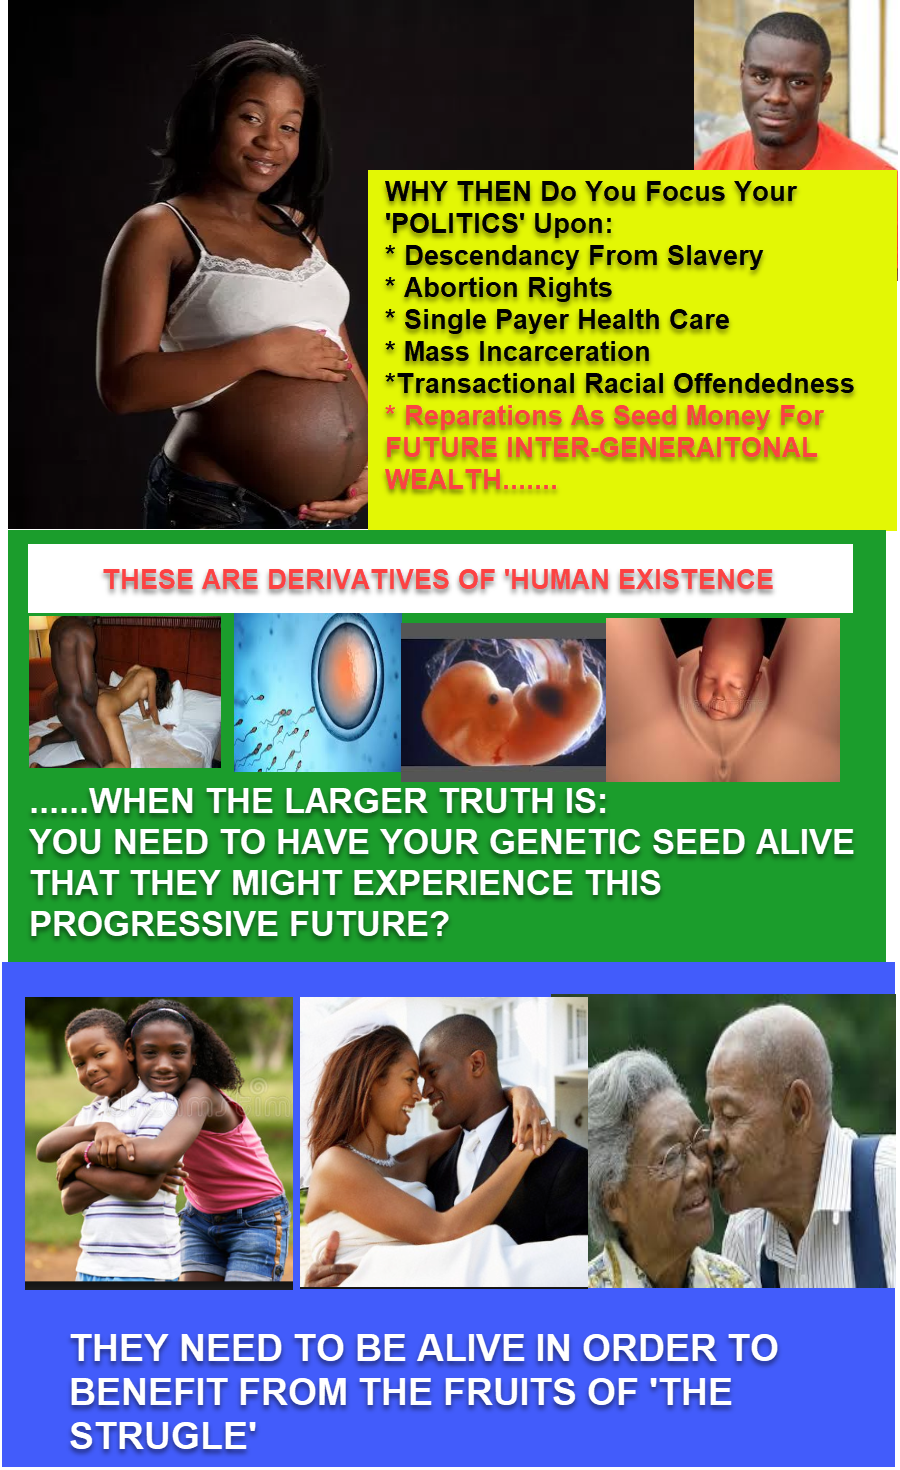 Sex inter generational transactional